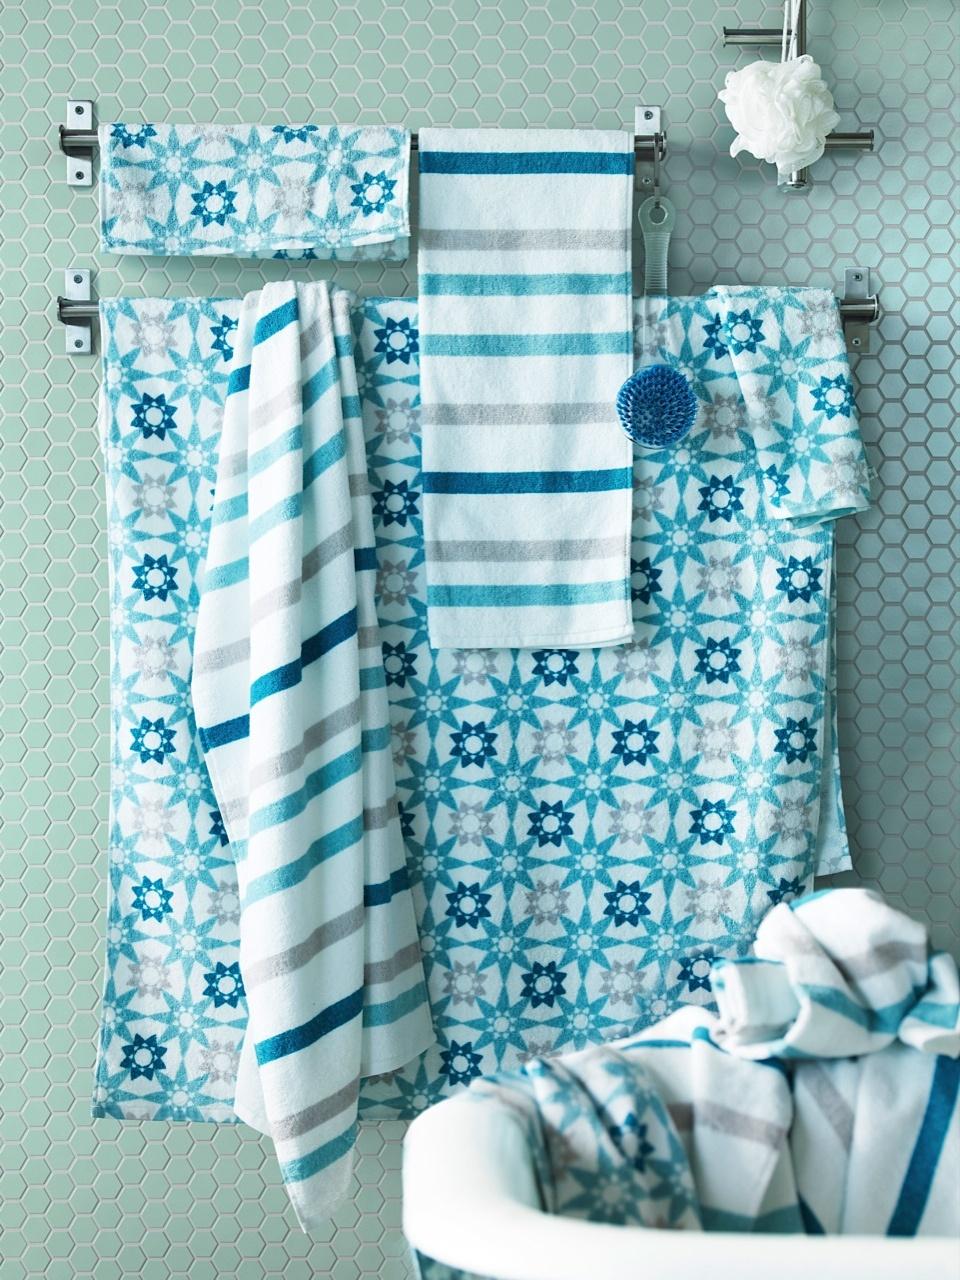 Ikea banos cortinas